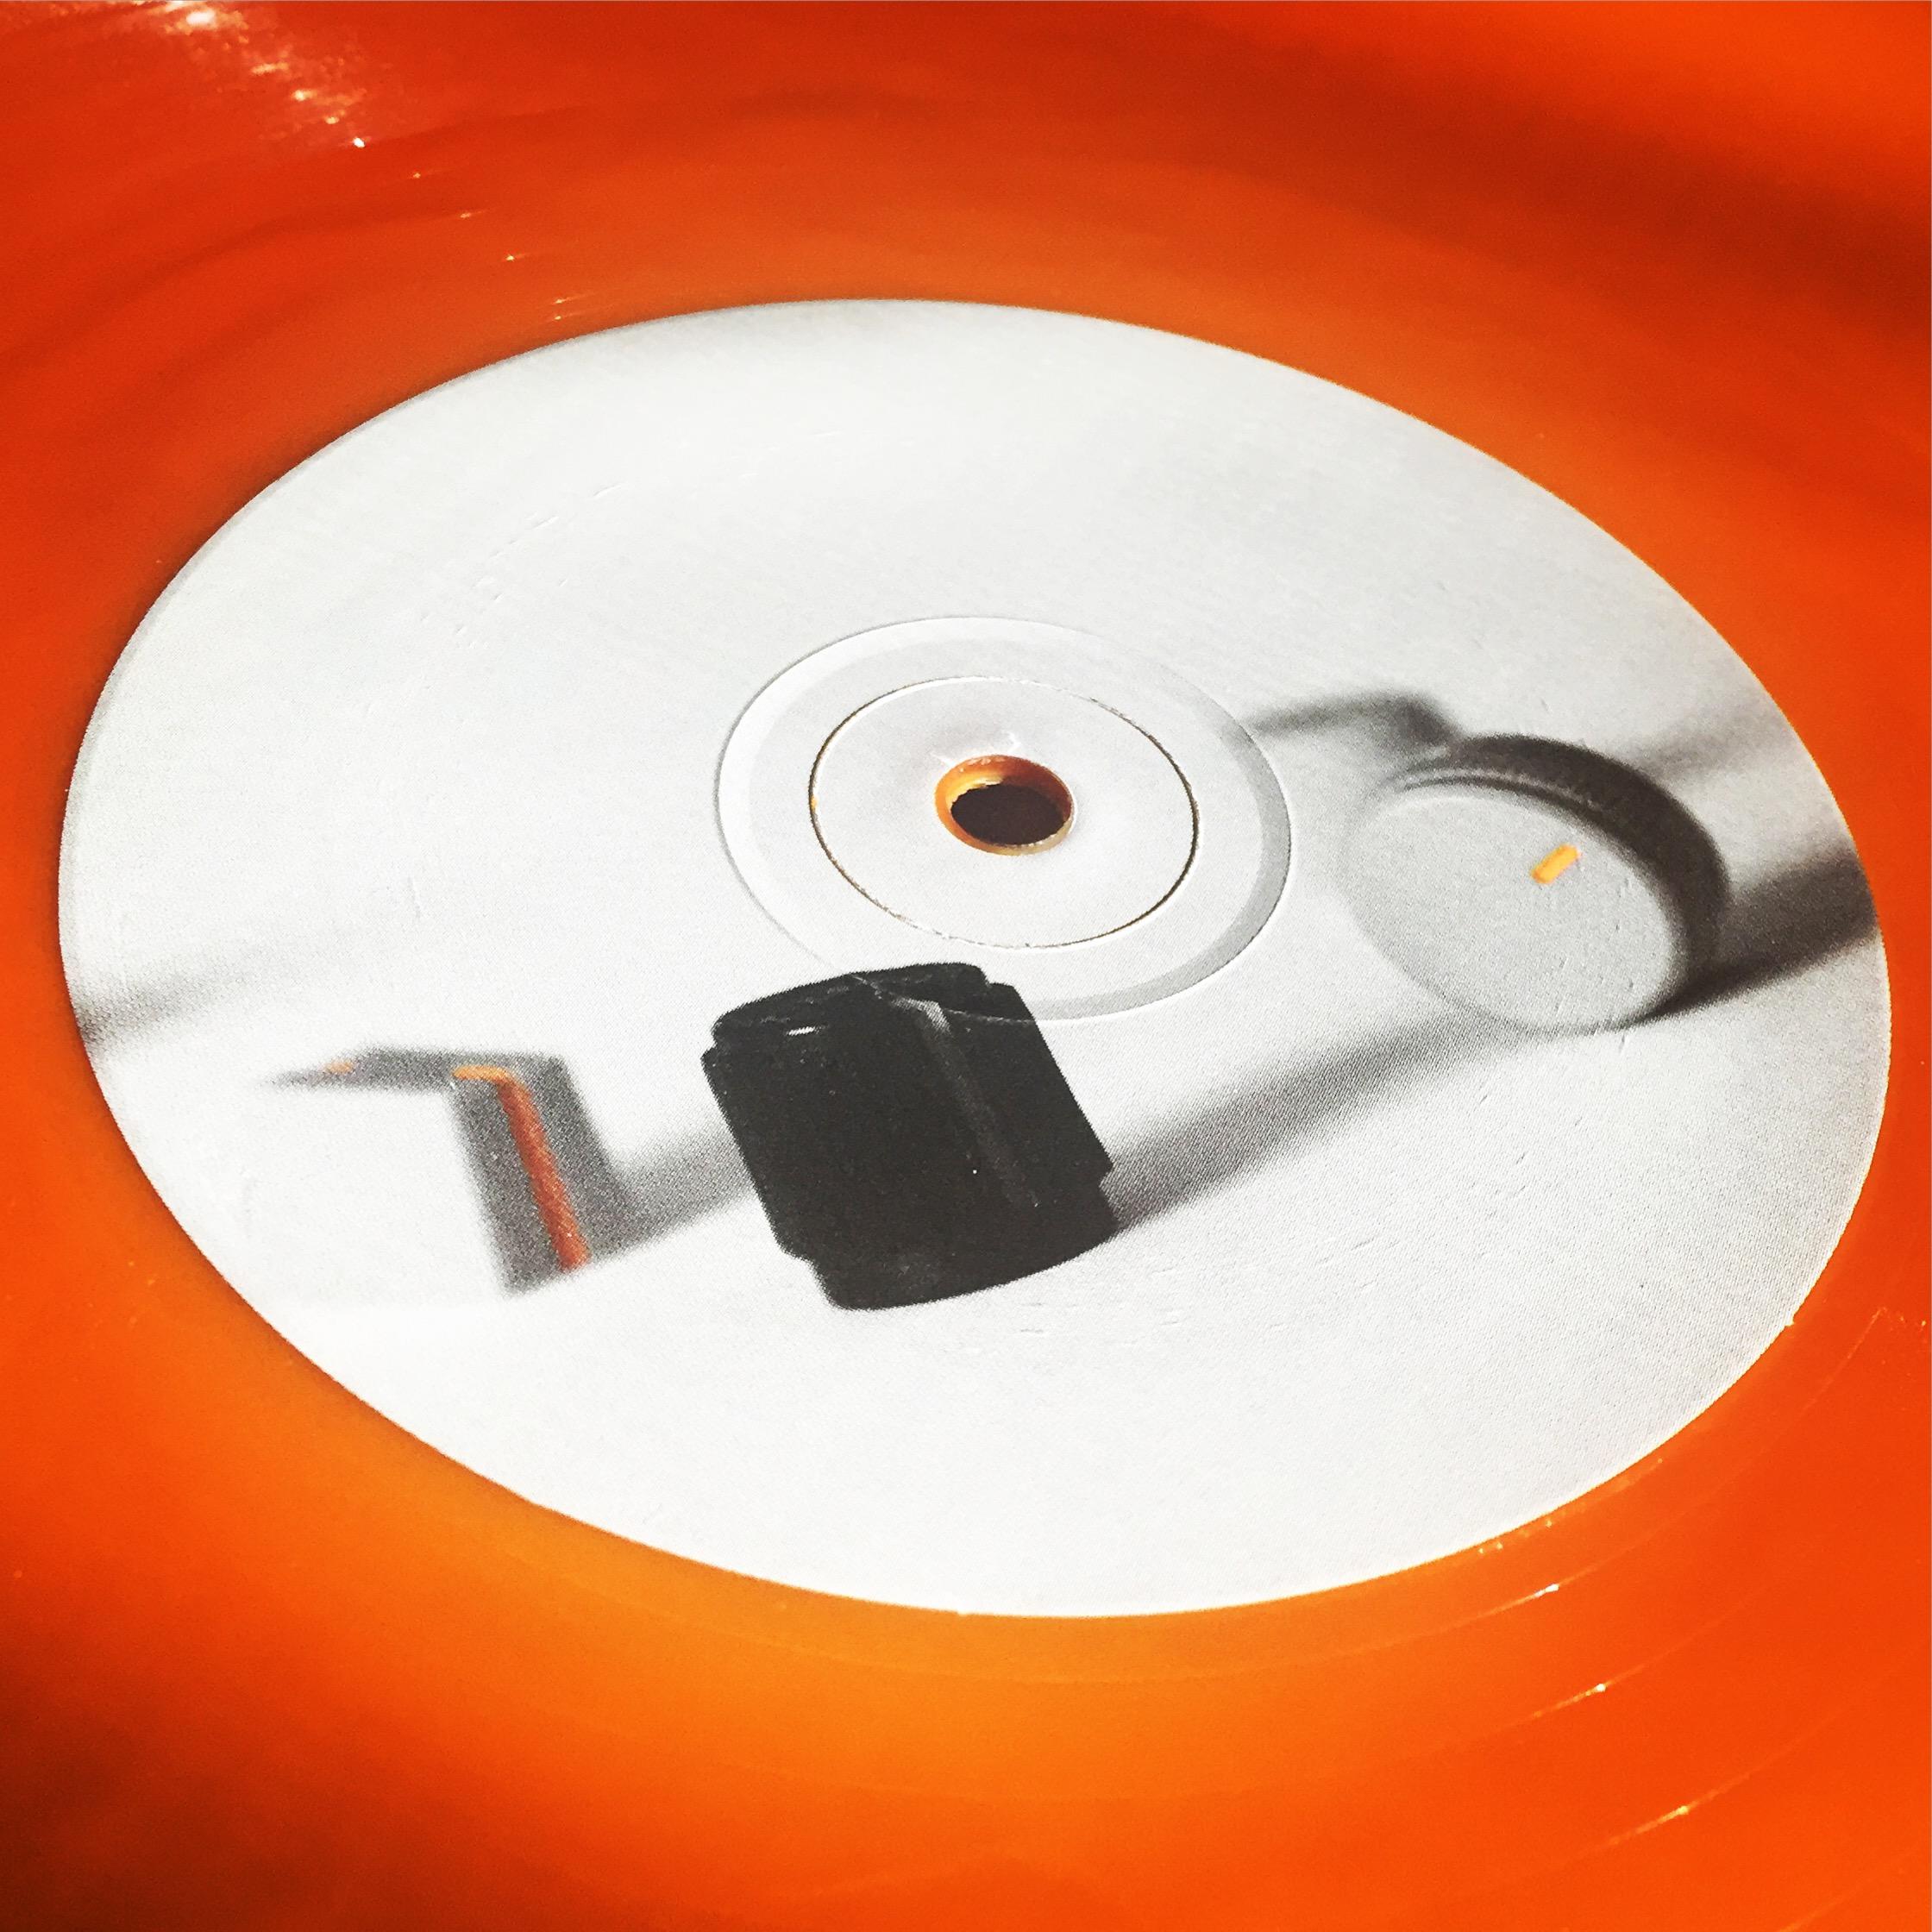 CDSN_OrangeJPG